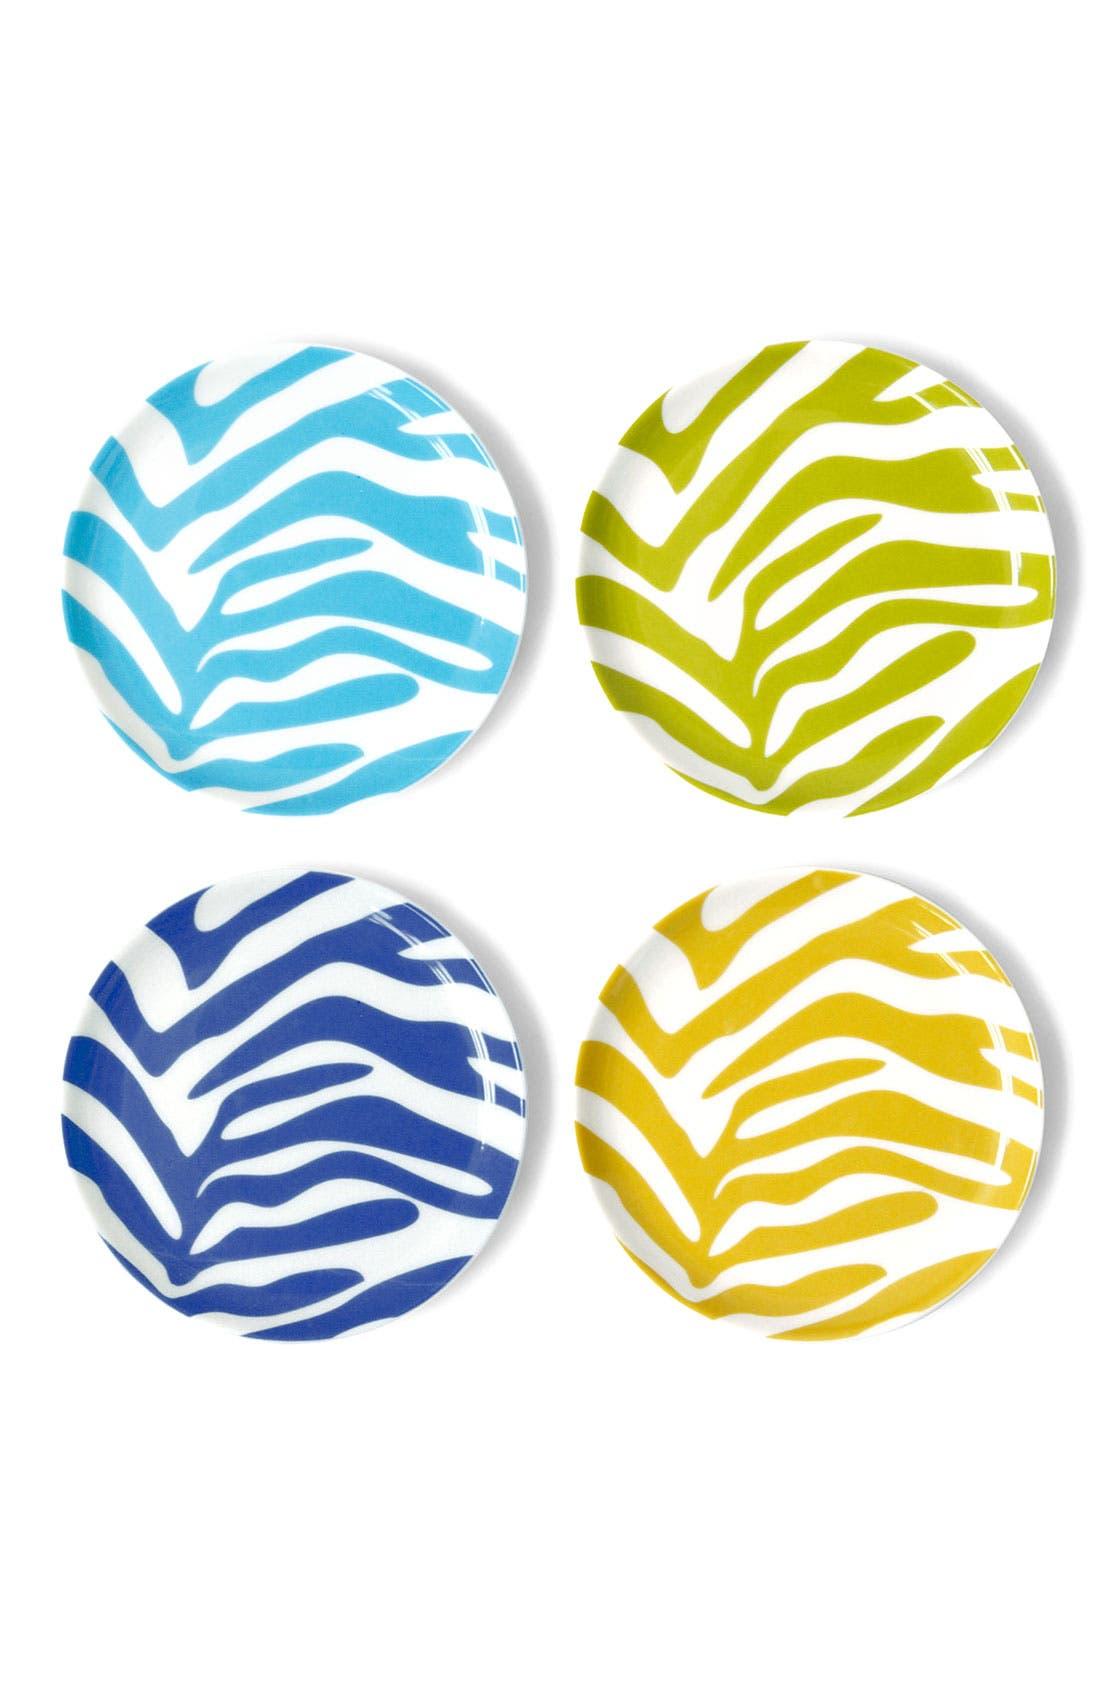 Alternate Image 1 Selected - Jonathan Adler 'Zebra' Porcelain Coasters